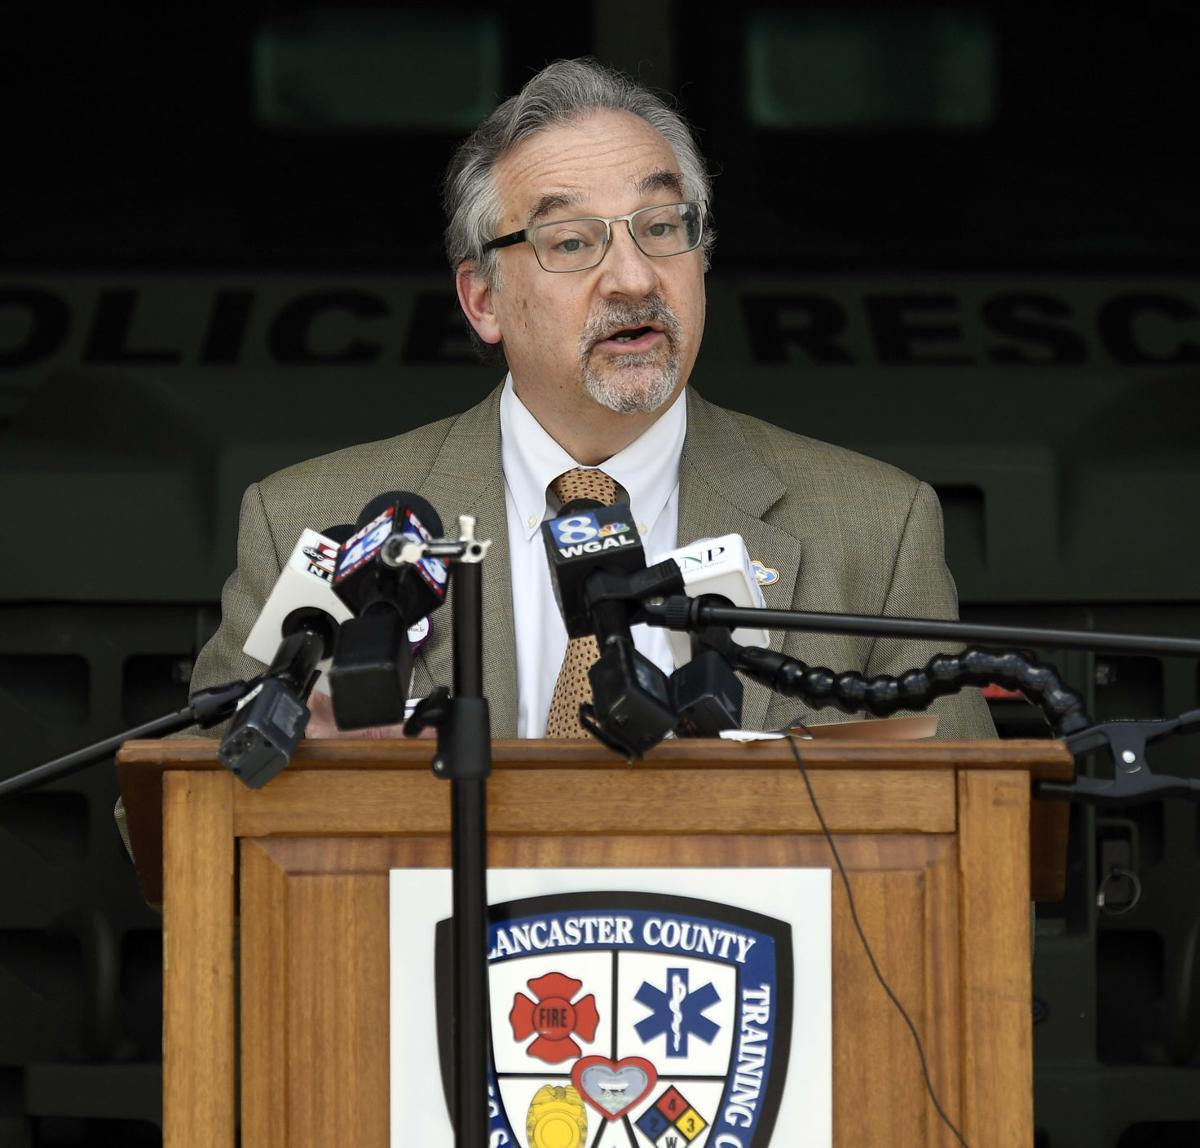 Lancaster County Covid-19 Press Conference